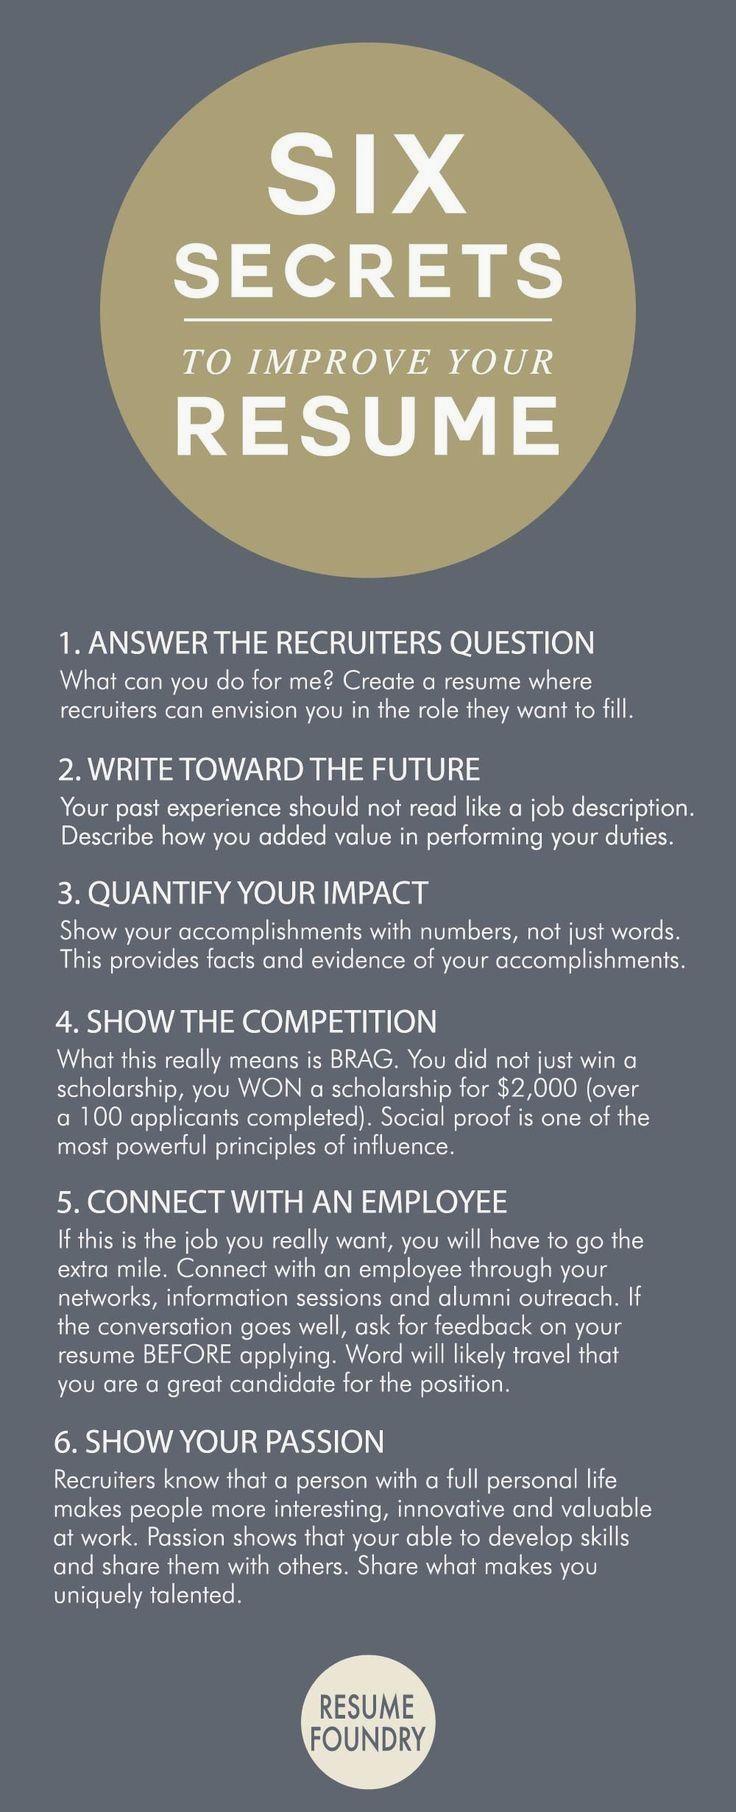 six secrets to improve your resume